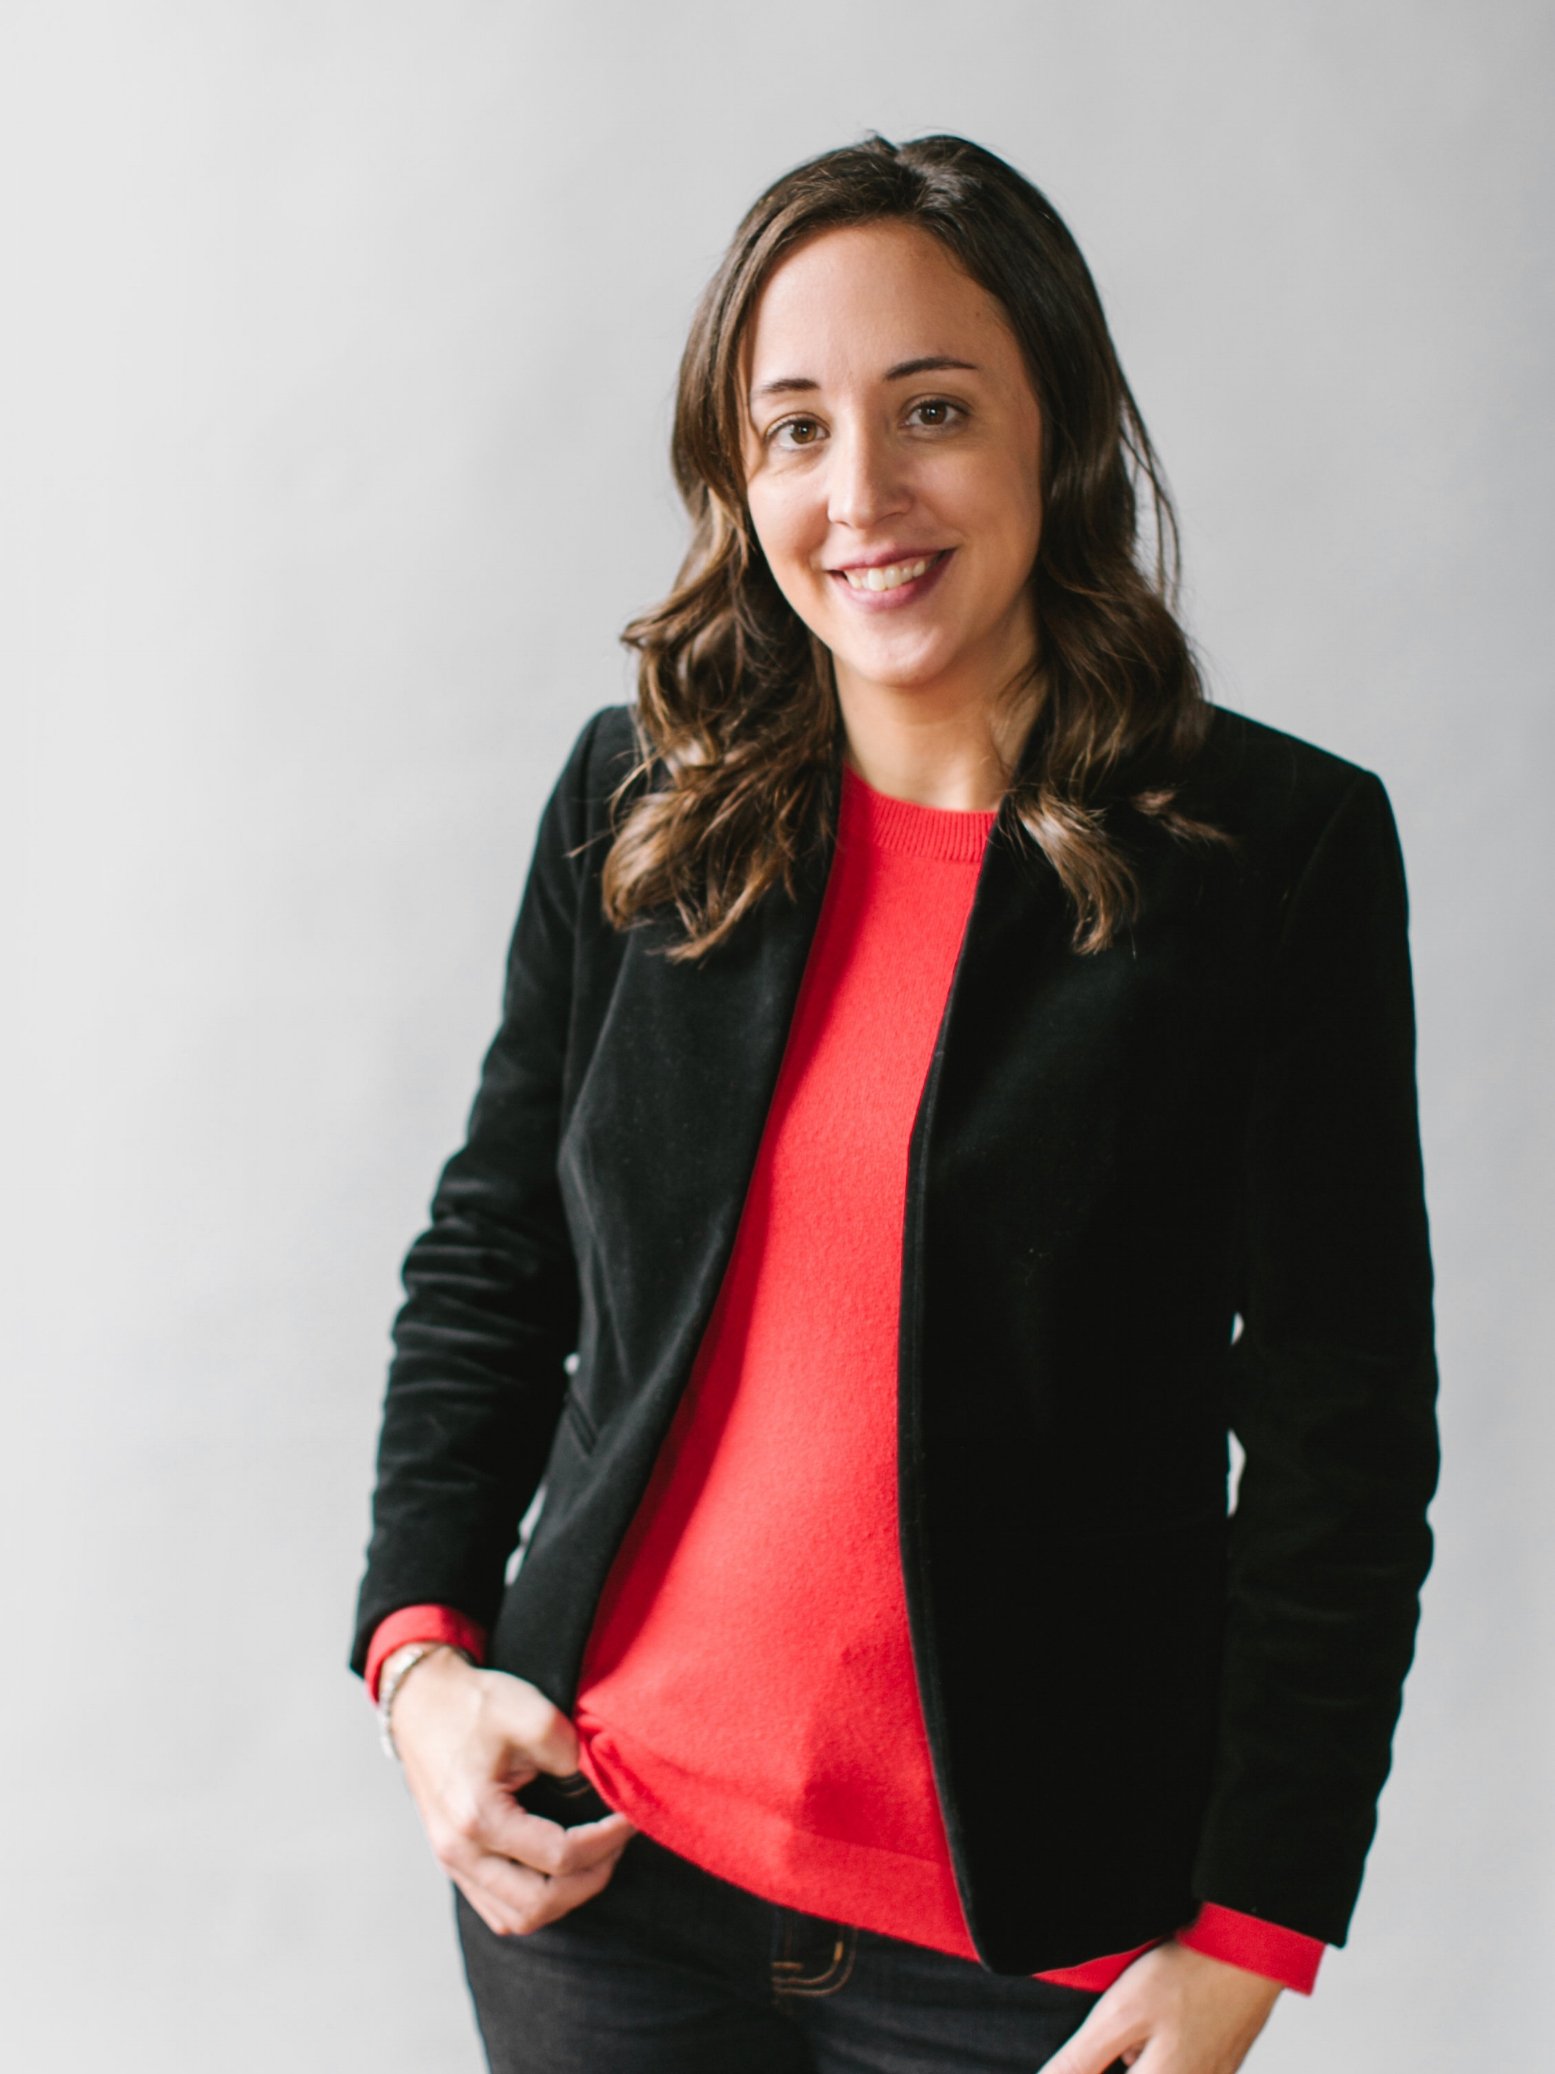 RHONDA HOSTETTER  Founder, Business Dream Coach, Mastermind Facilitator